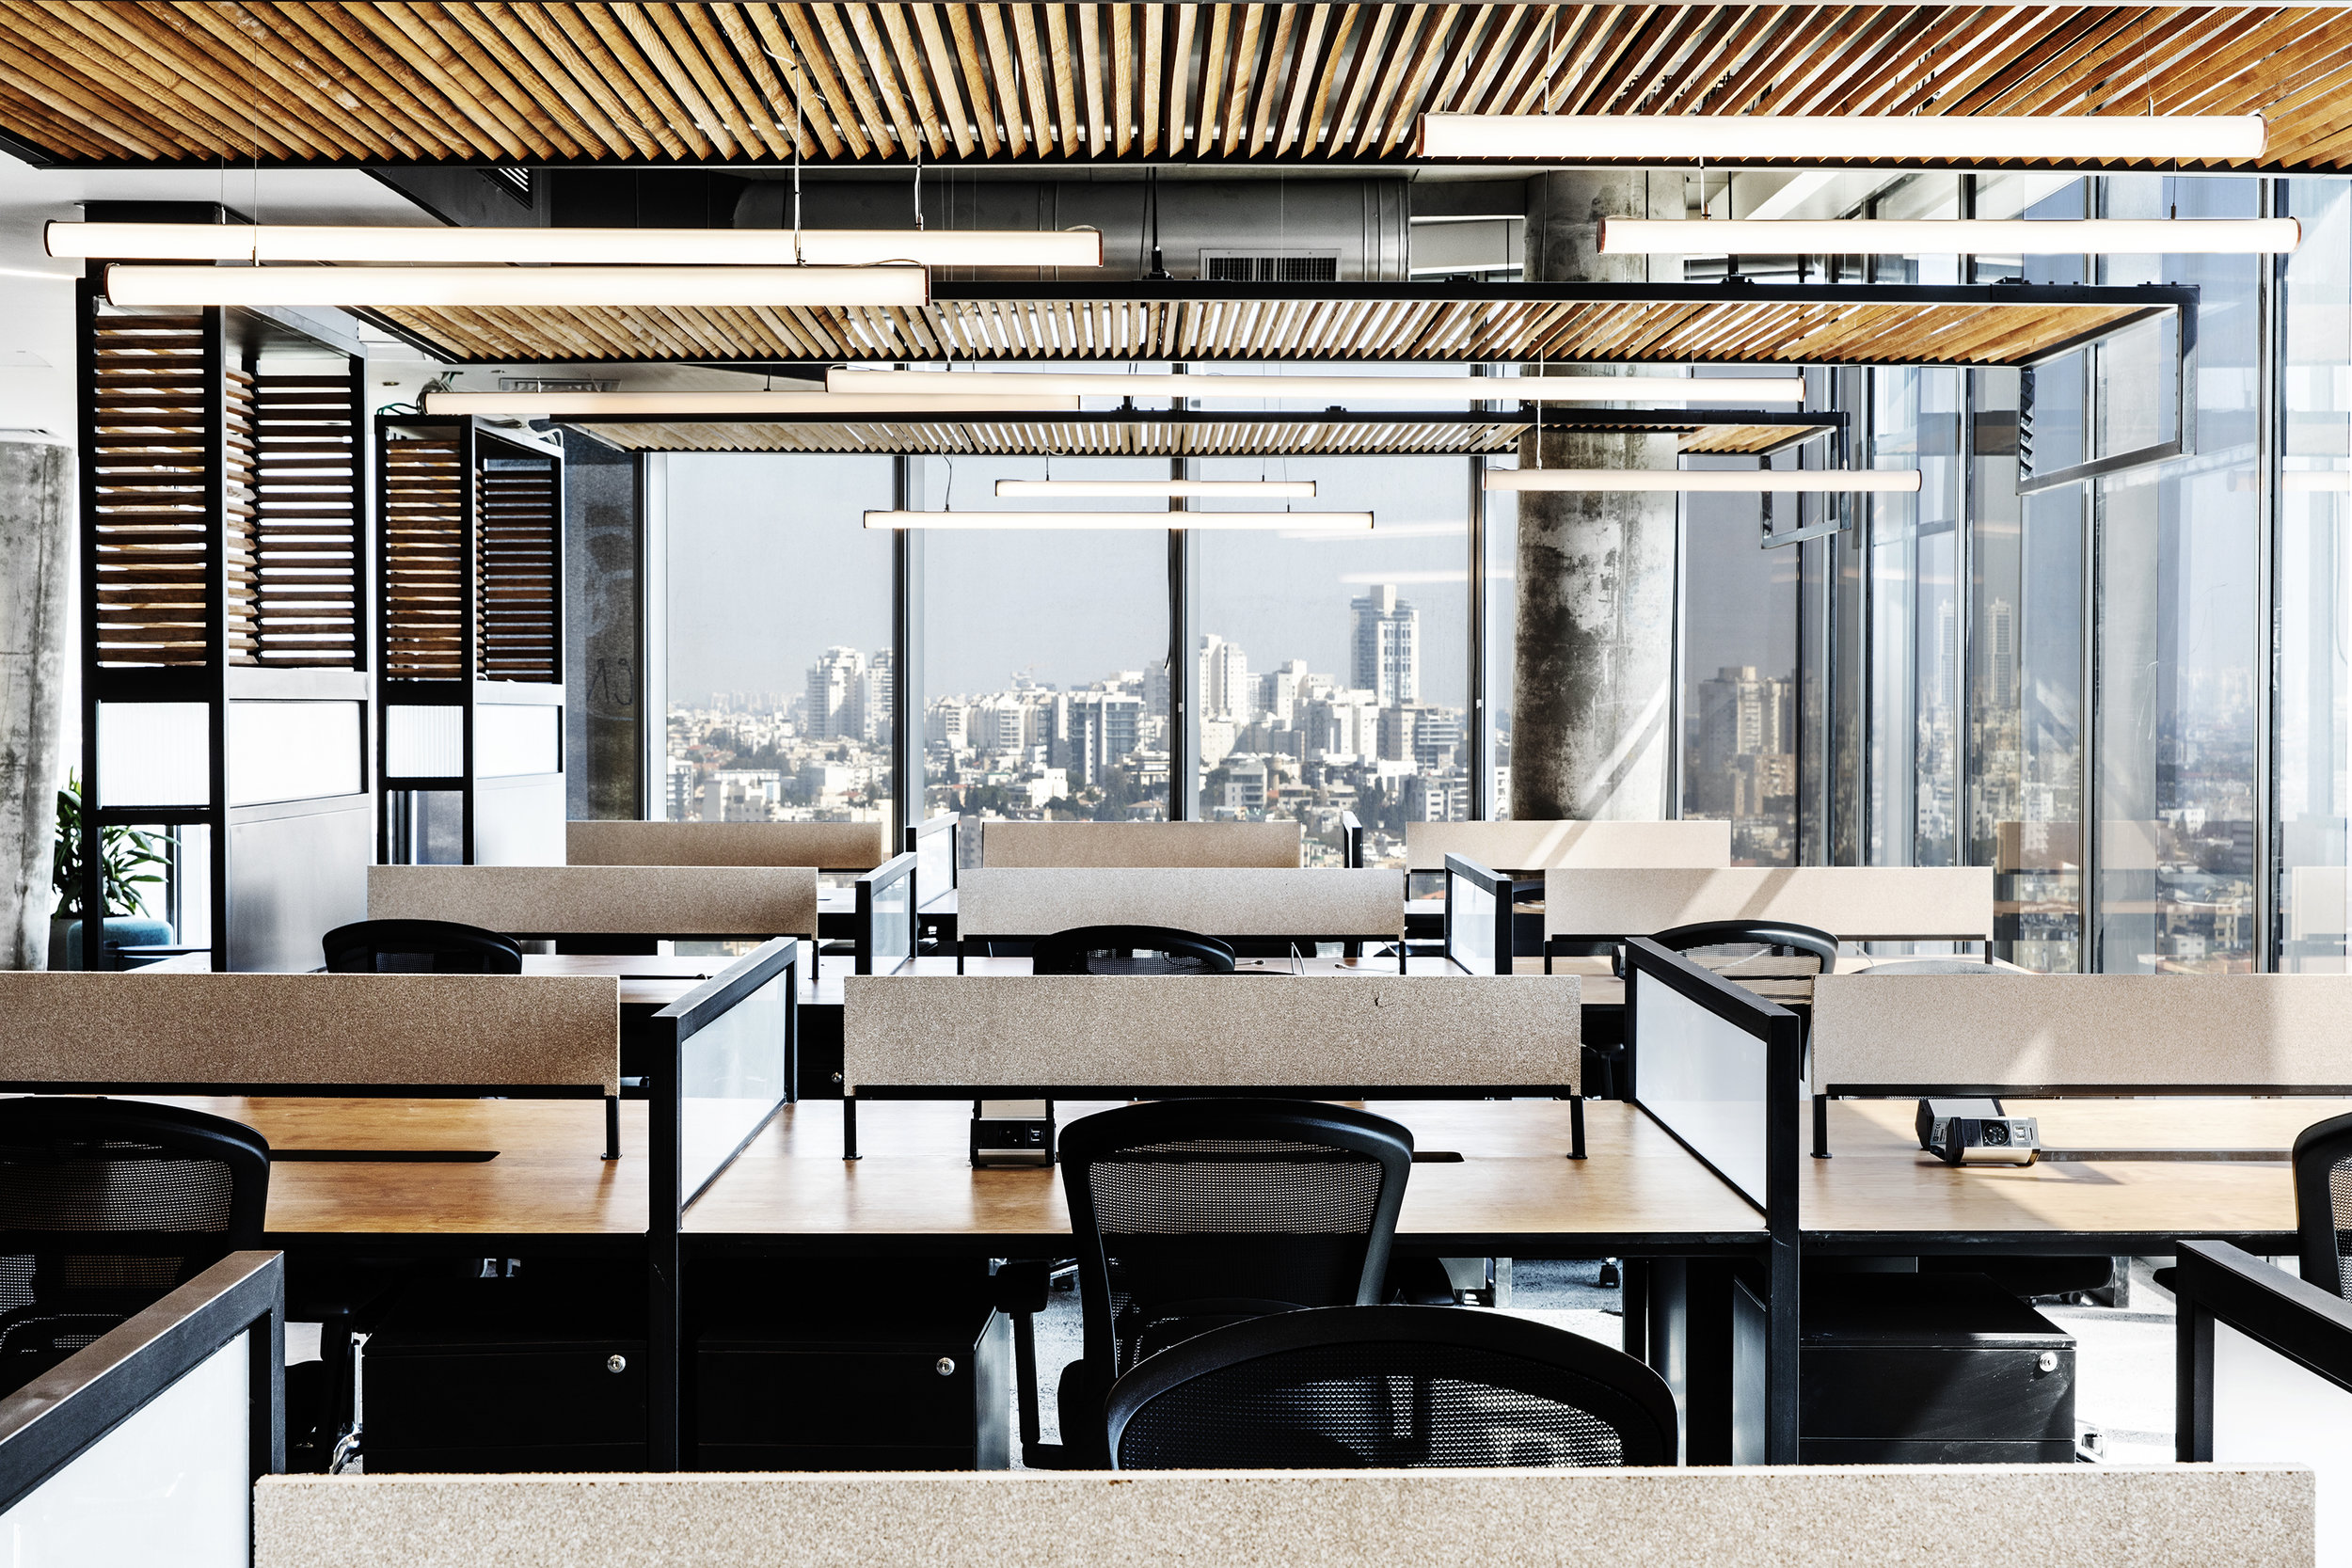 רואי דוד אדריכלות - אדריכל - נטורל אינטליג'נס - ROY DAVID - ARCHITECTURE - ARCHITECT - NI (71).jpg